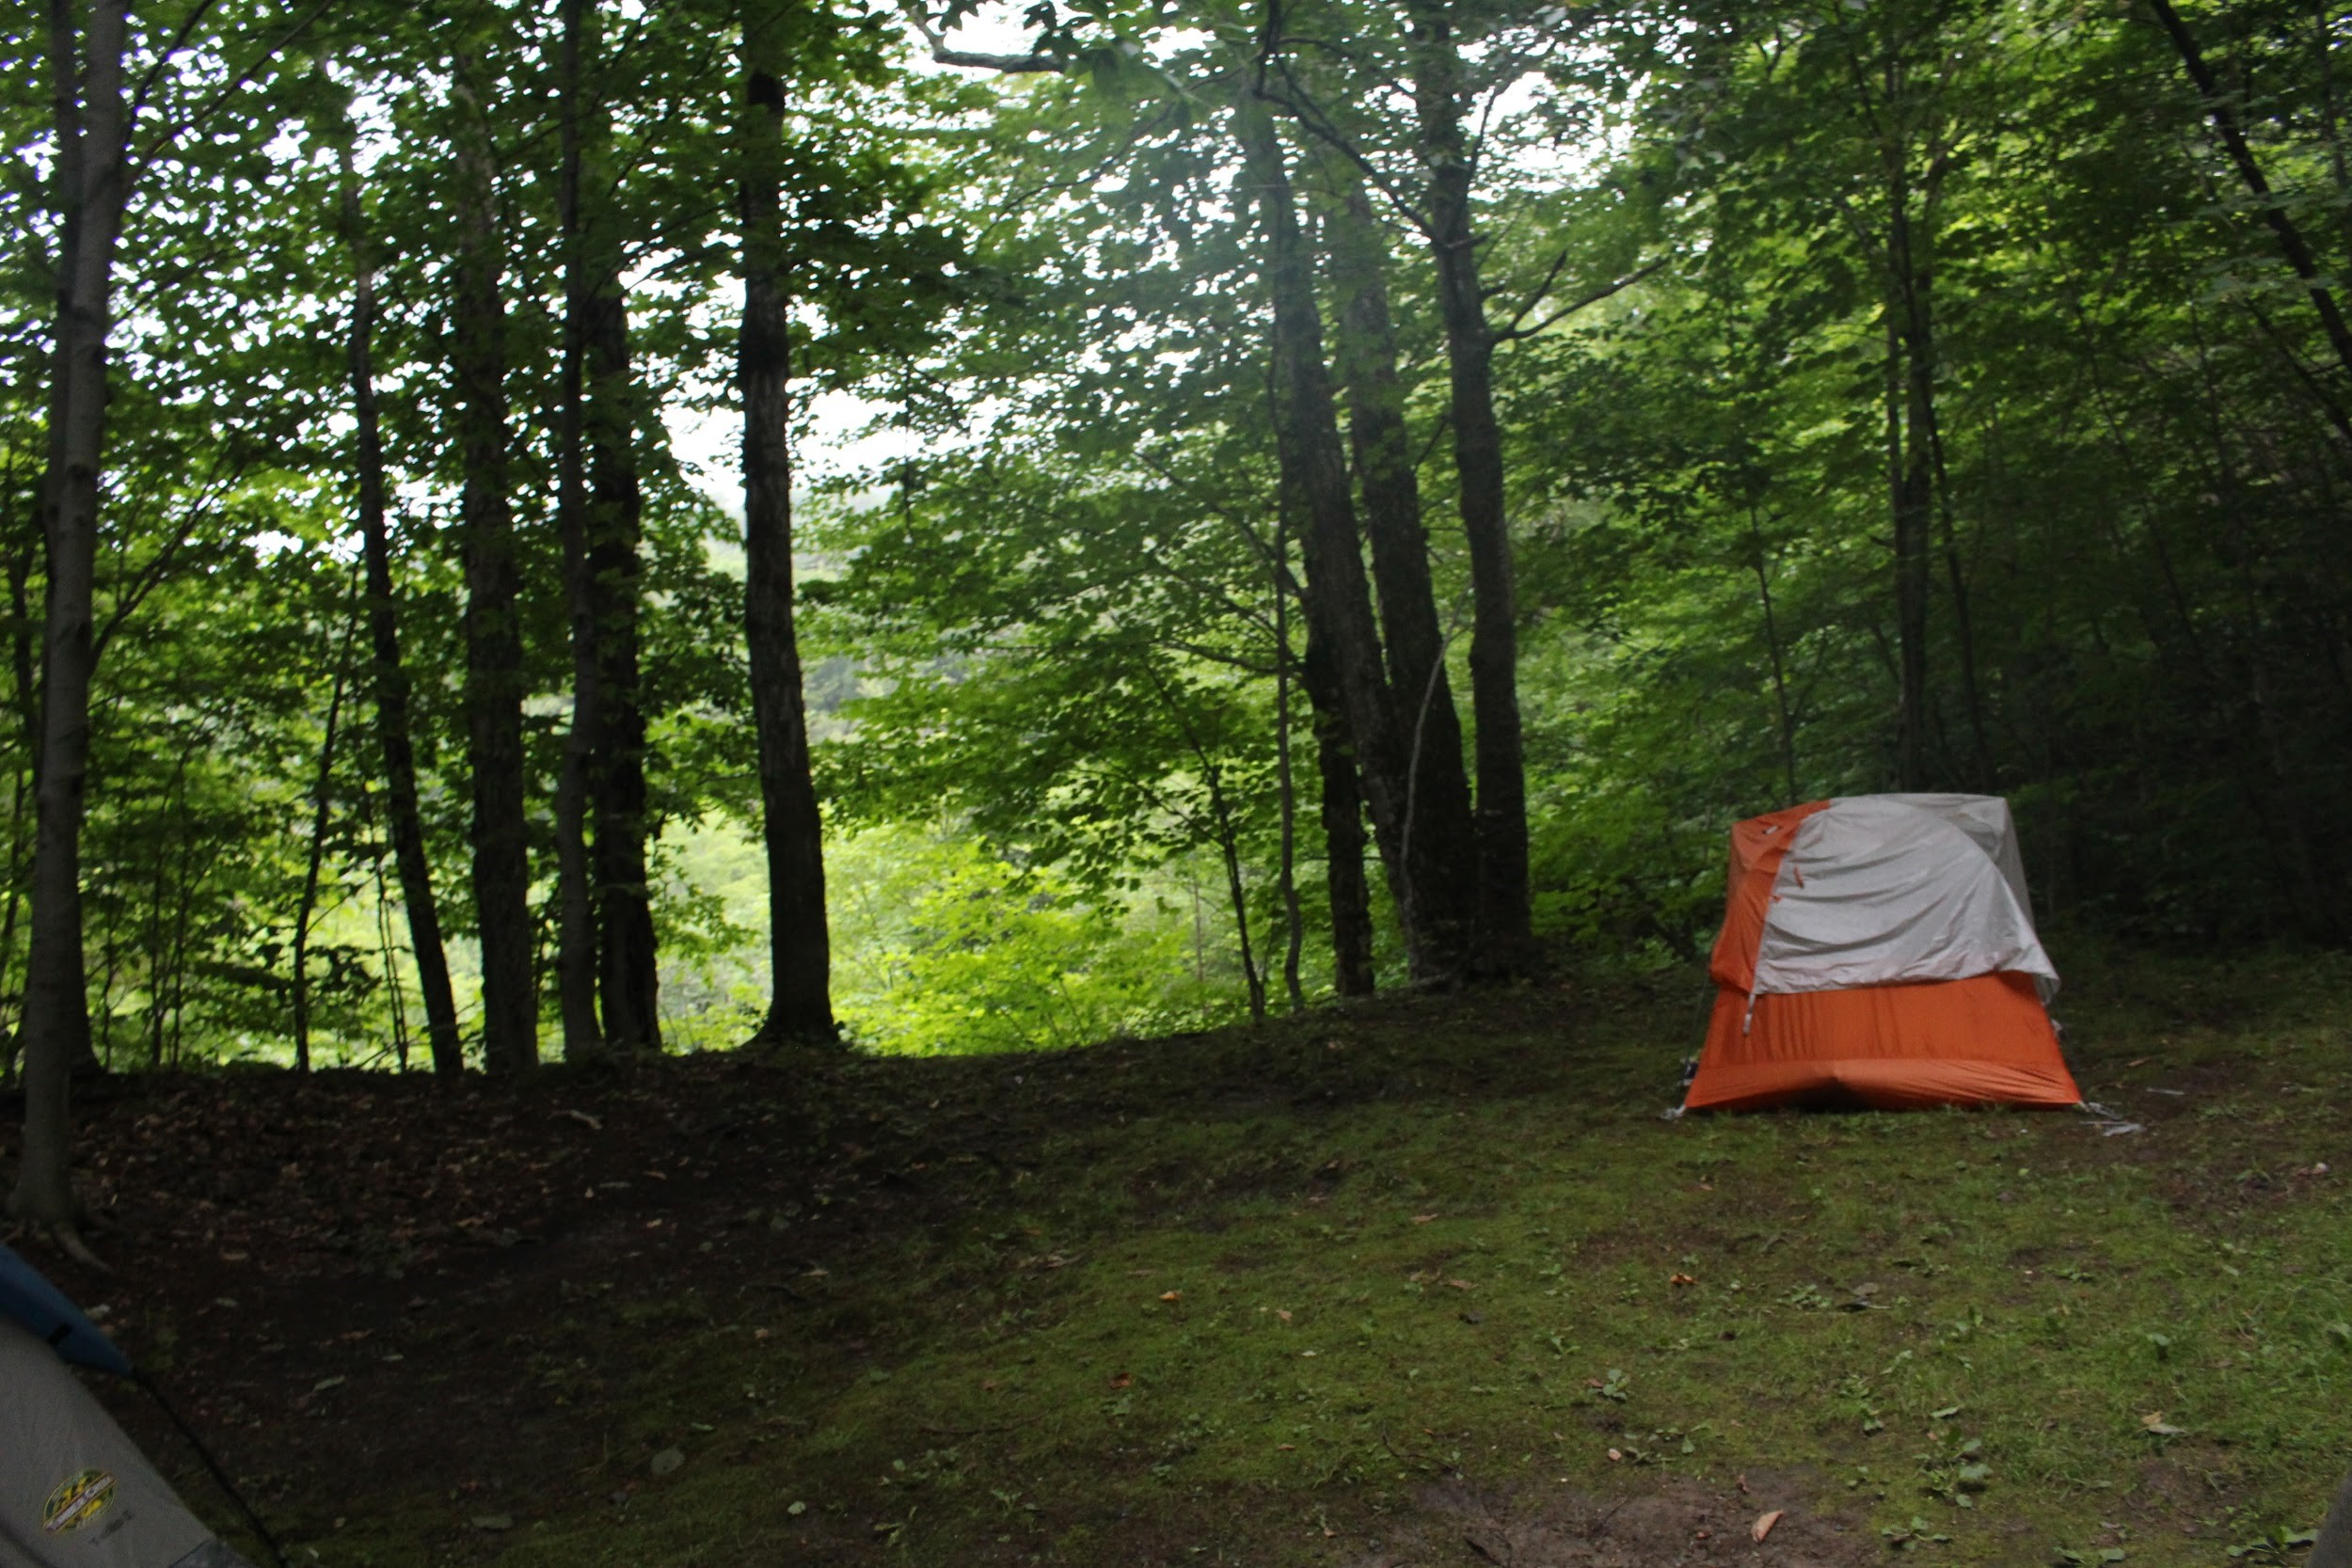 Campsite at Underhill State Park